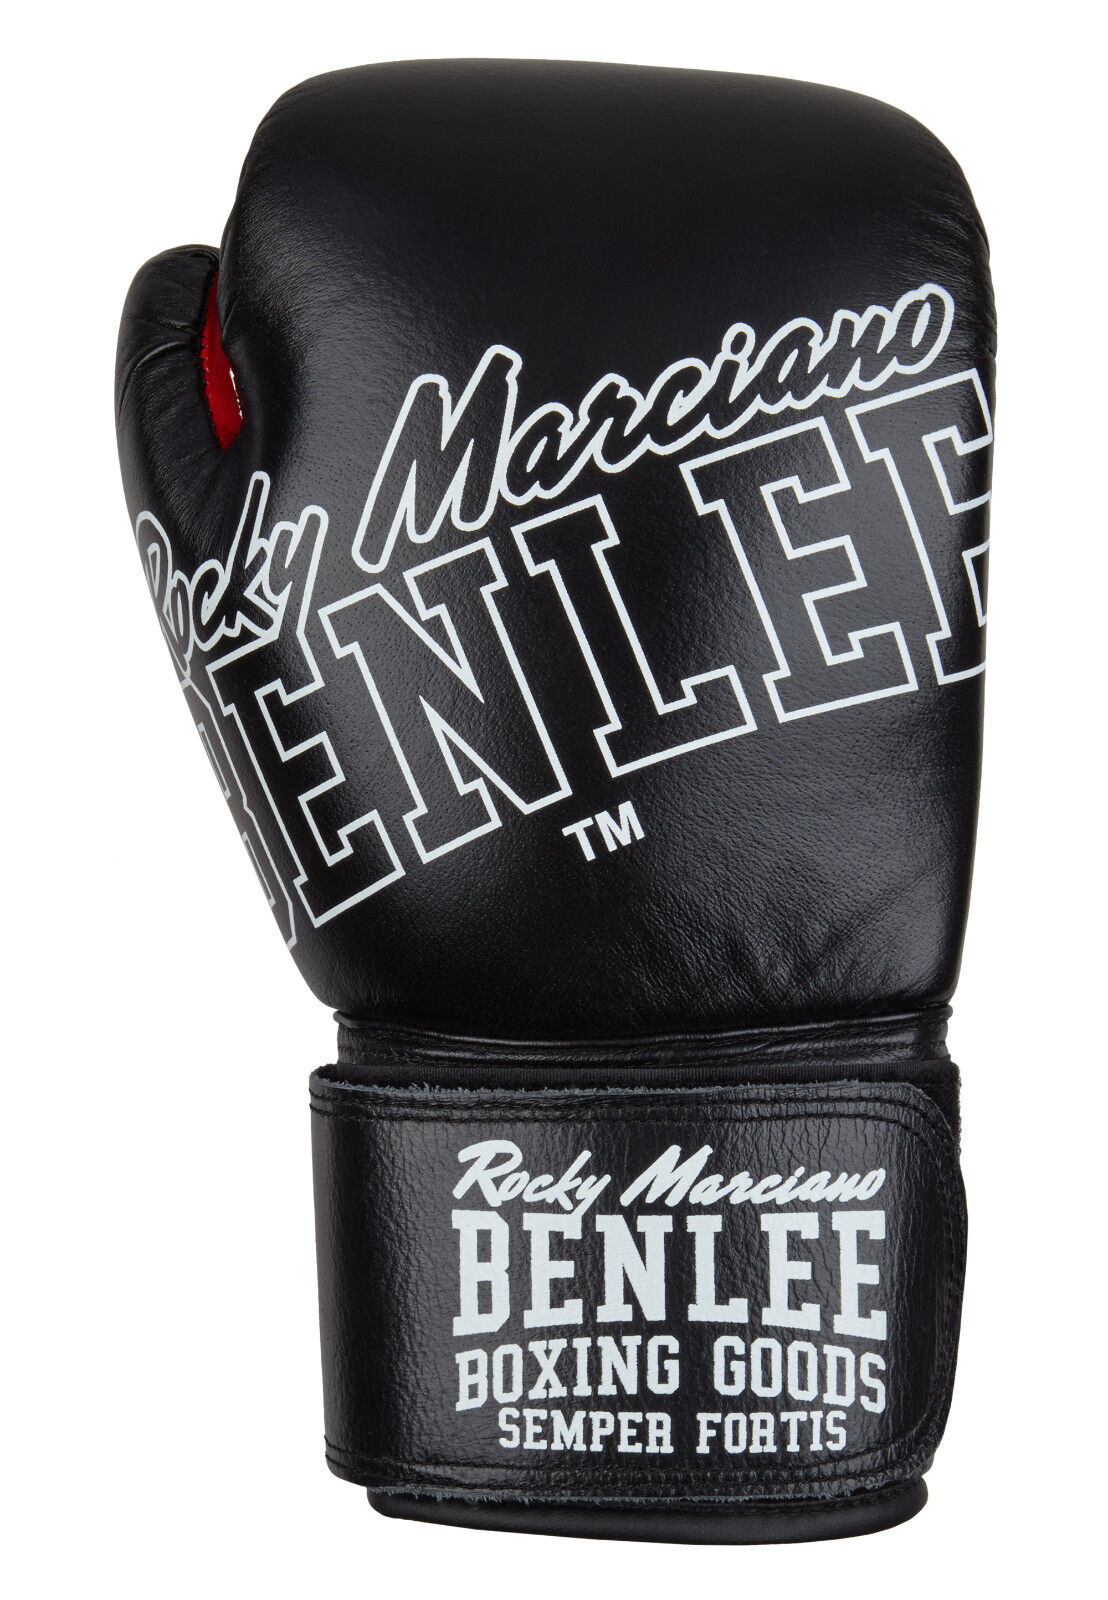 BenLee Leder Boxhandschuhe Rockland Rockland Rockland für Boxen und KIckboxen 6ed65d